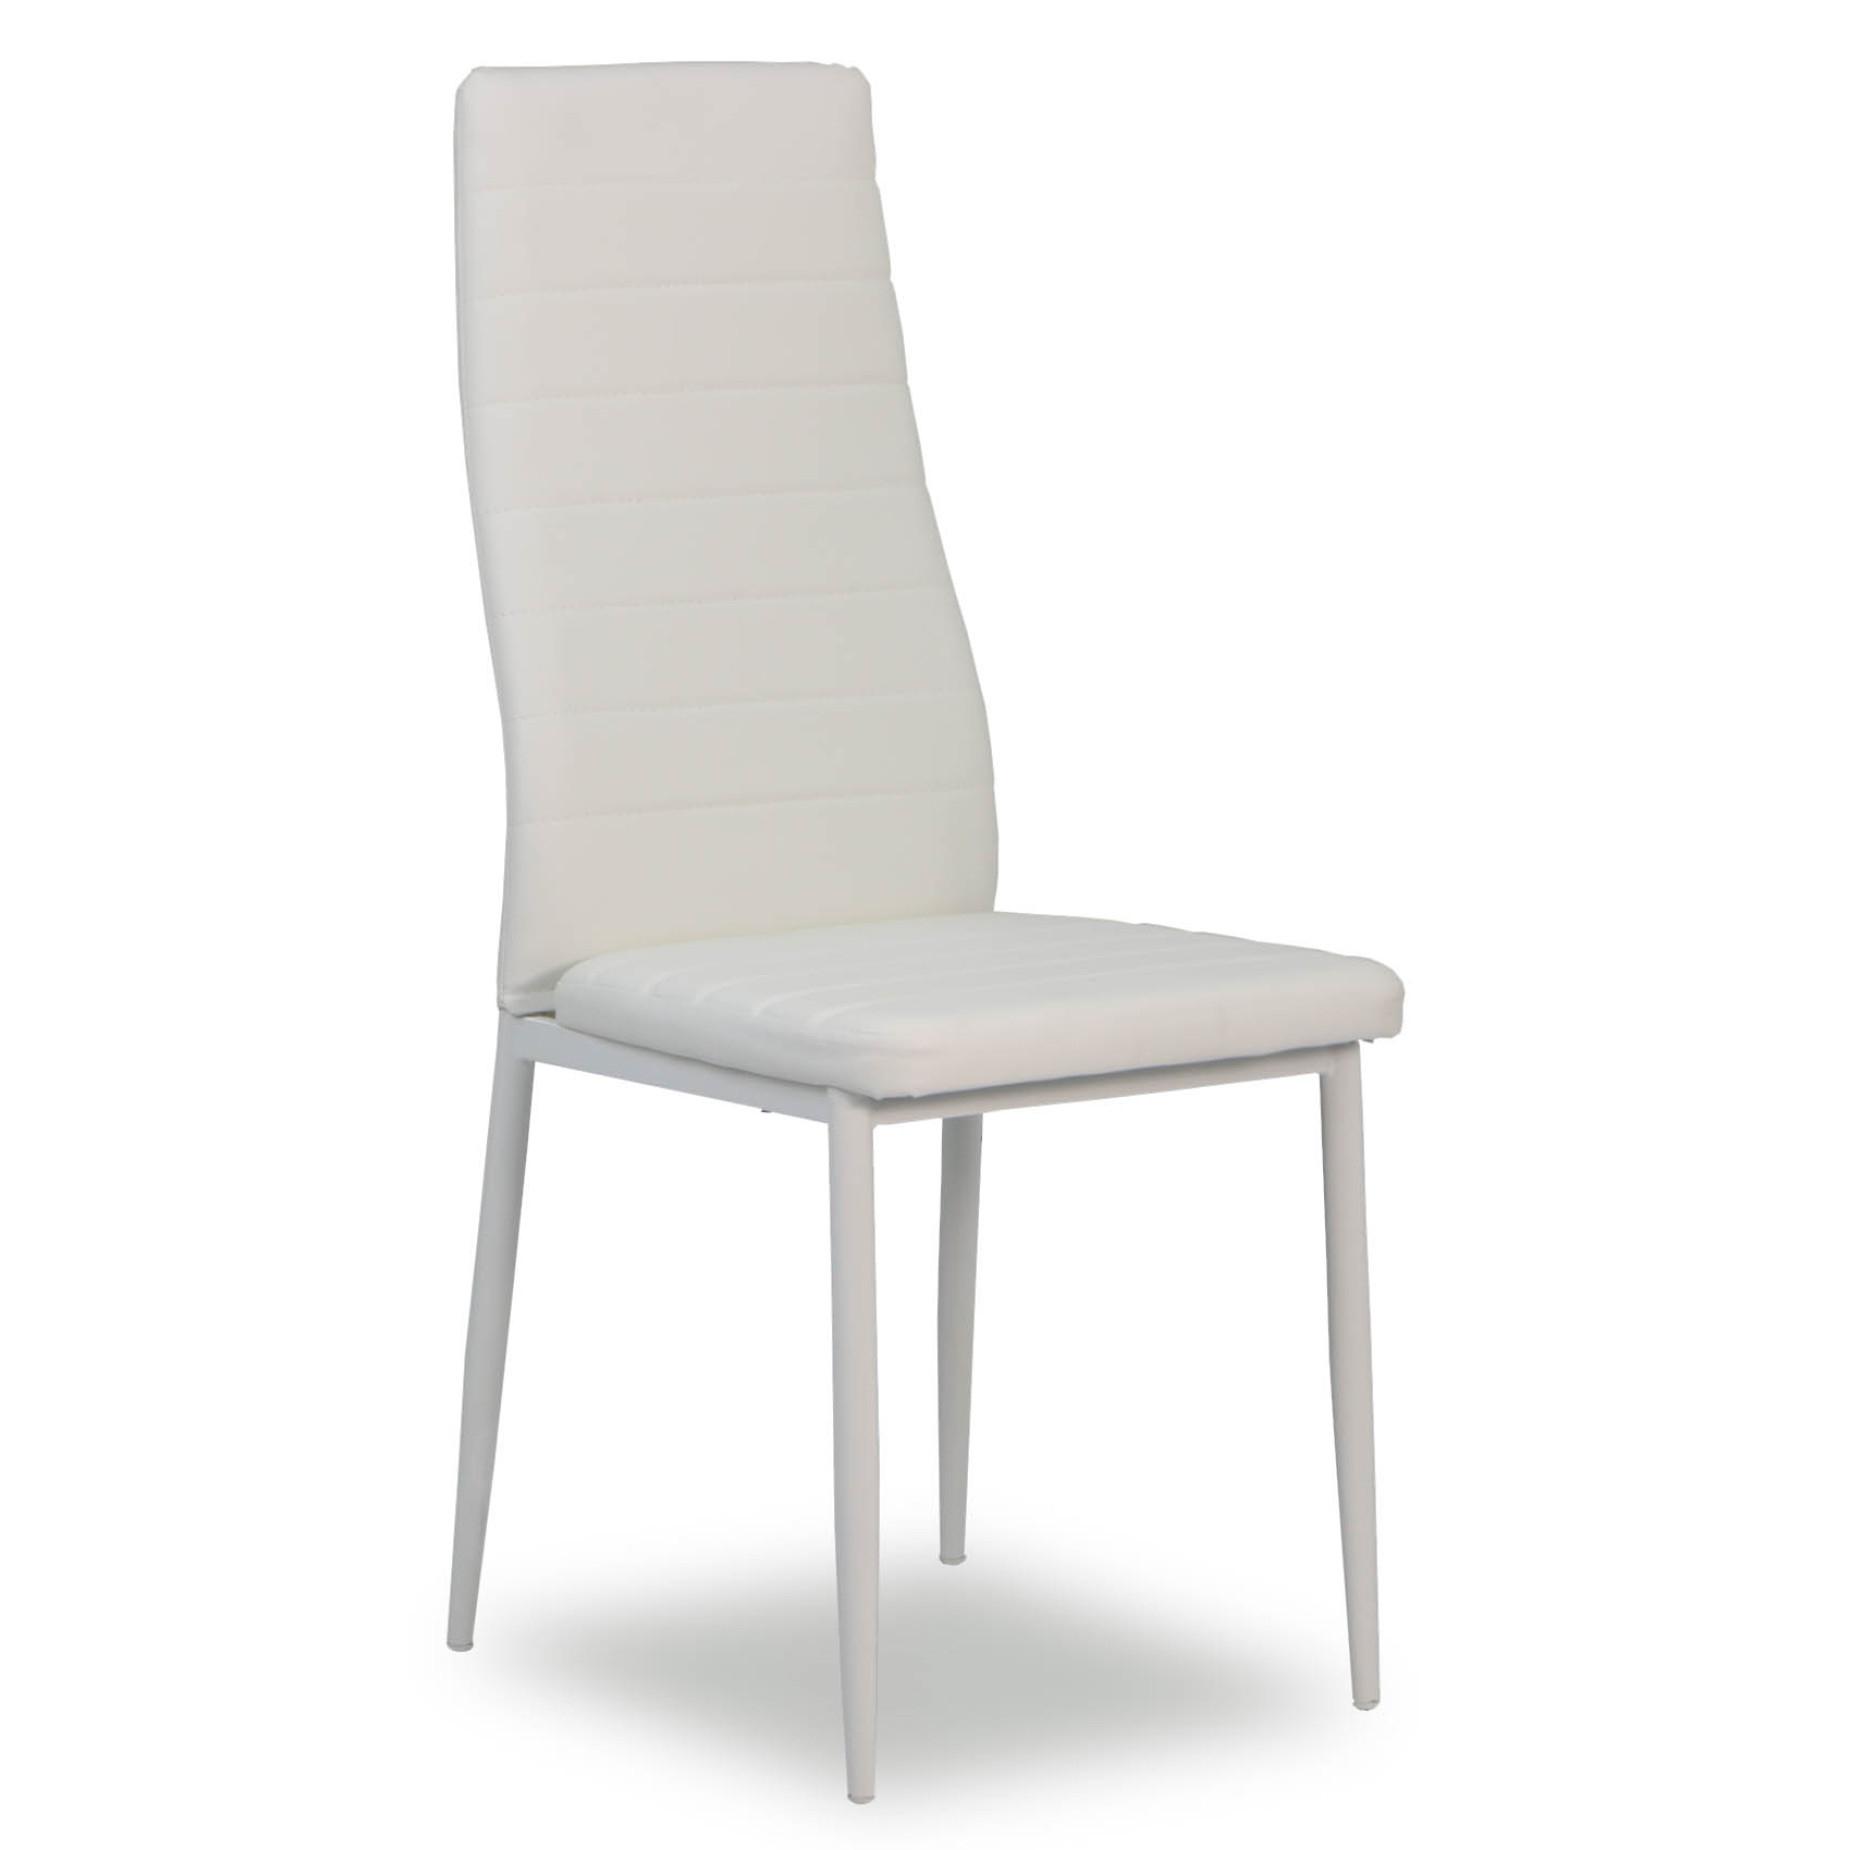 Quinn Dining Chair White | Furniture & Home Décor | Fortytwo Inside Quinn Teak Sofa Chairs (Photo 6 of 20)